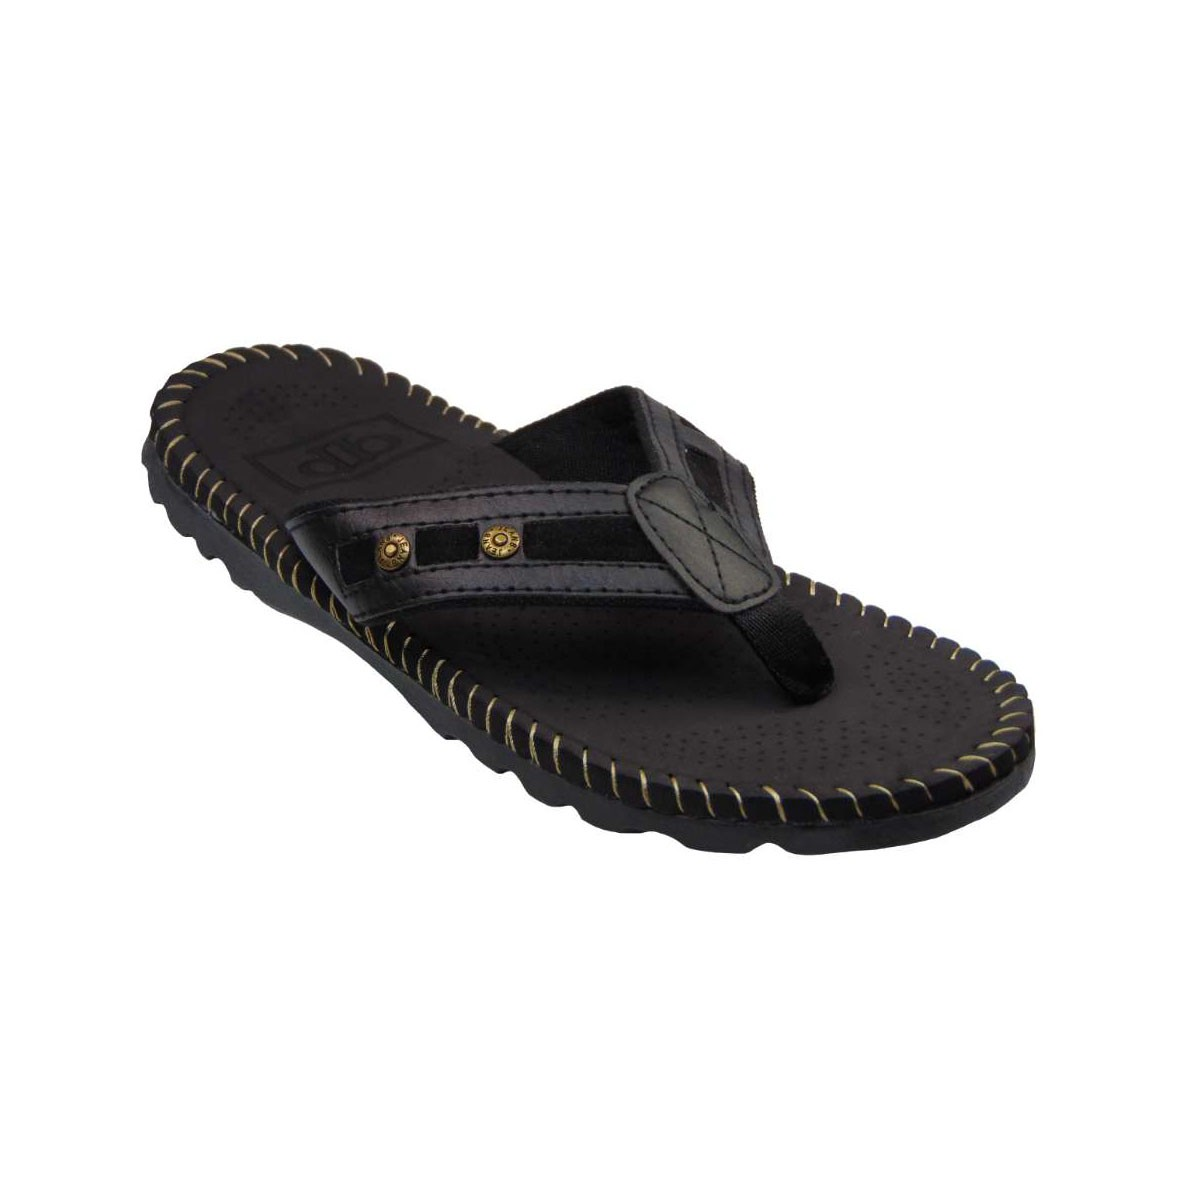 6f5168ccbfa qp andrikh sagionara mayro tsimpolis shoes. Ανδρικά Παπούτσια / Σαγιονάρες